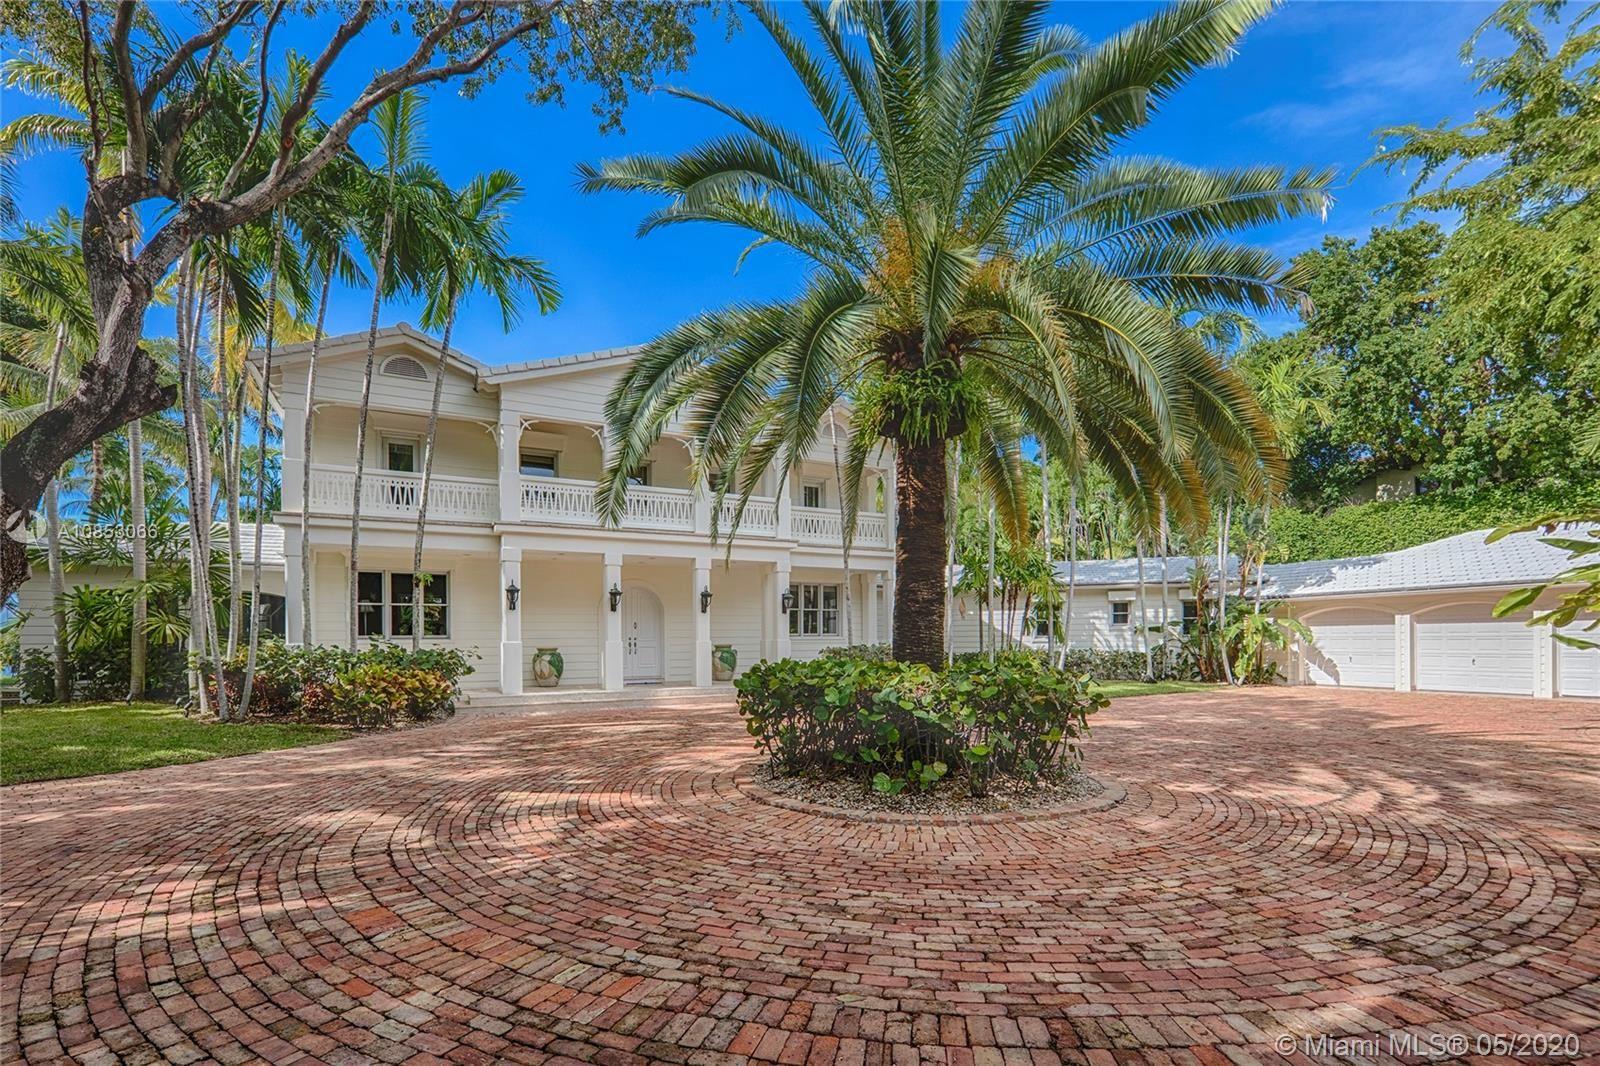 Photo 3 of Listing MLS a10853066 in 1 Star Island Dr Miami Beach FL 33139